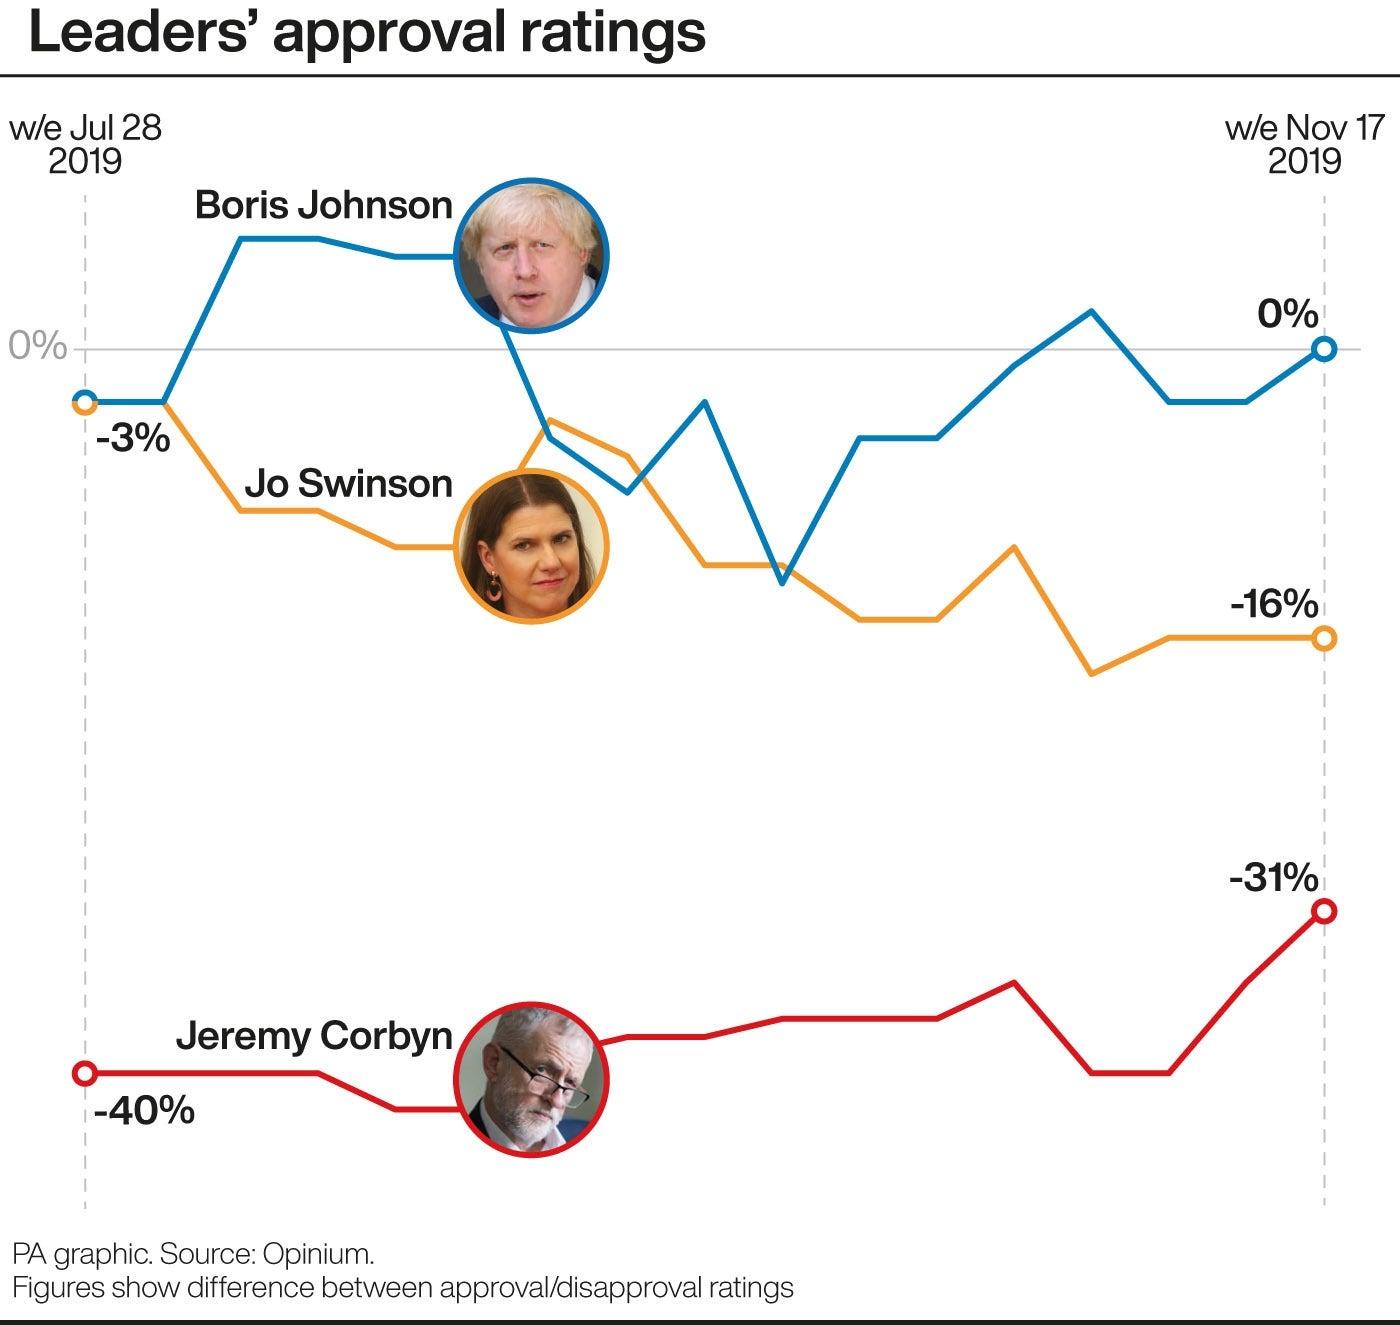 Leaders' approval ratings